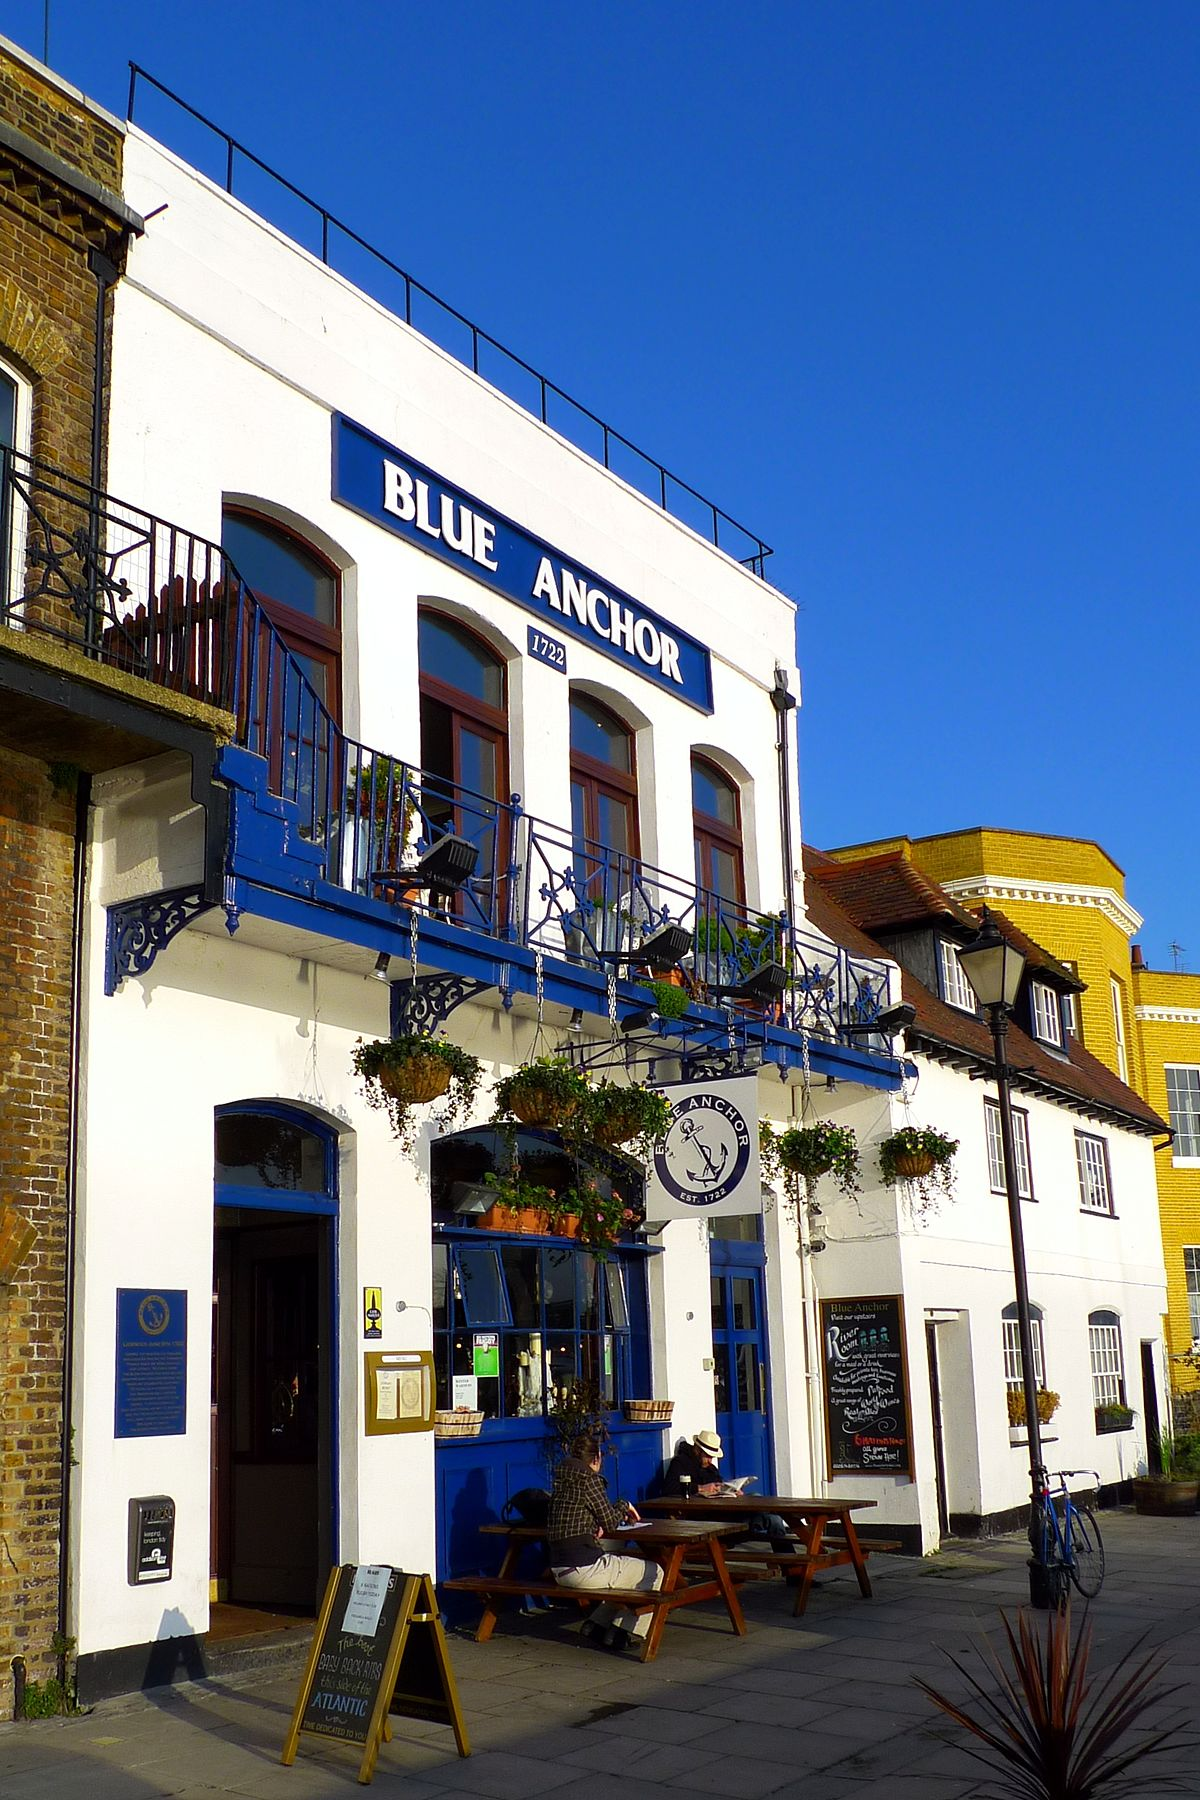 Blue Anchor Hammersmith Wikipedia